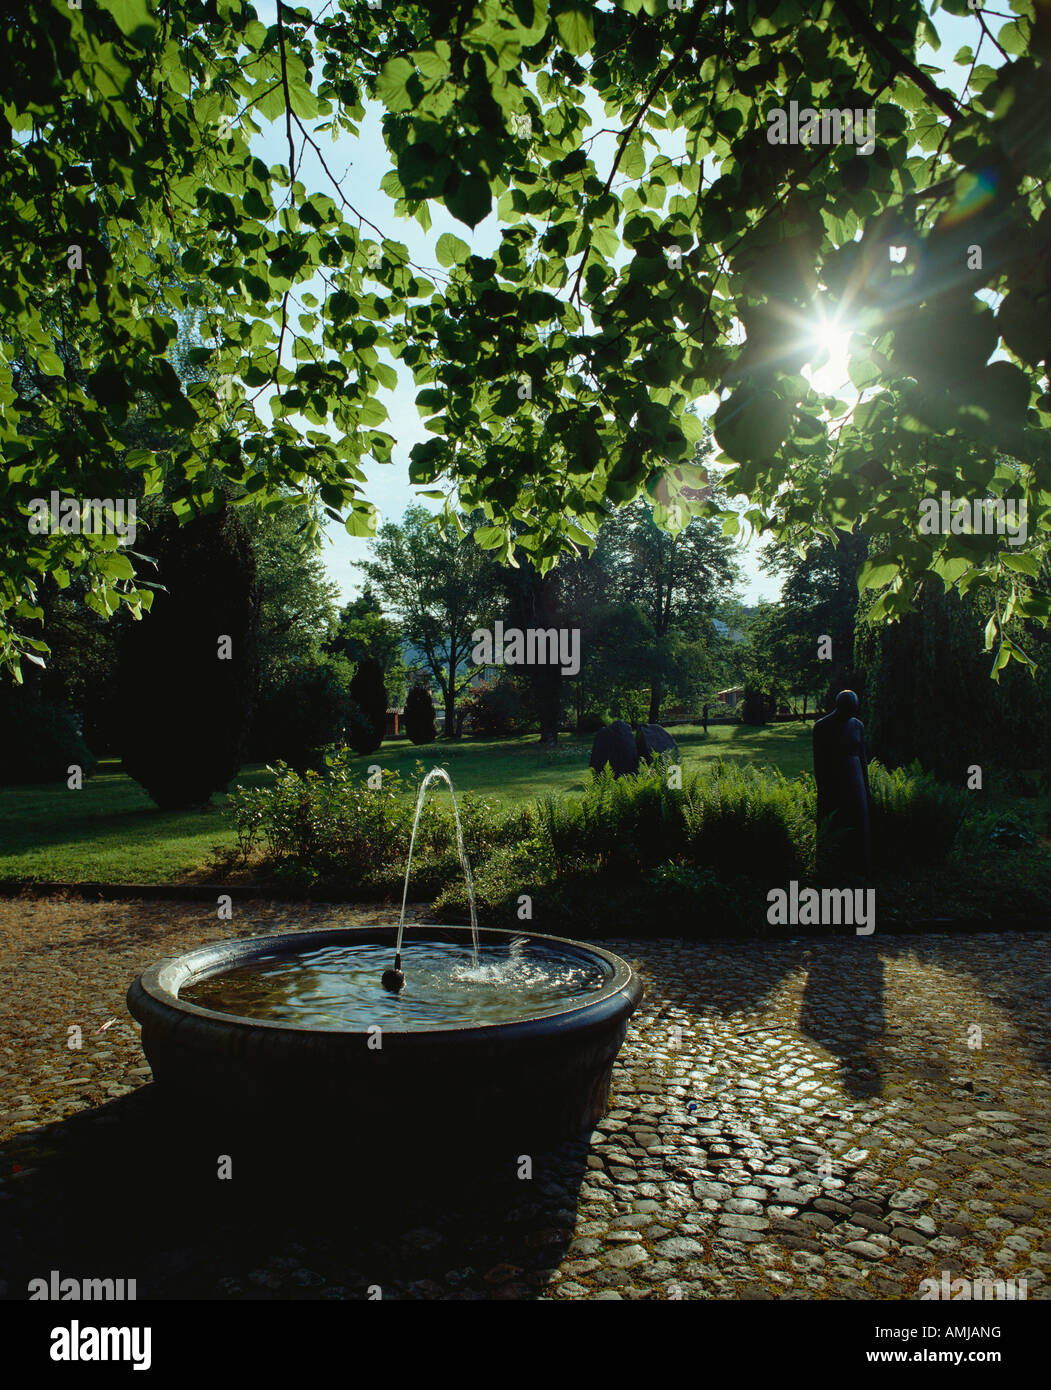 May 2000 Switzerland Zofingen Fountain in garden sunrise - Stock Image